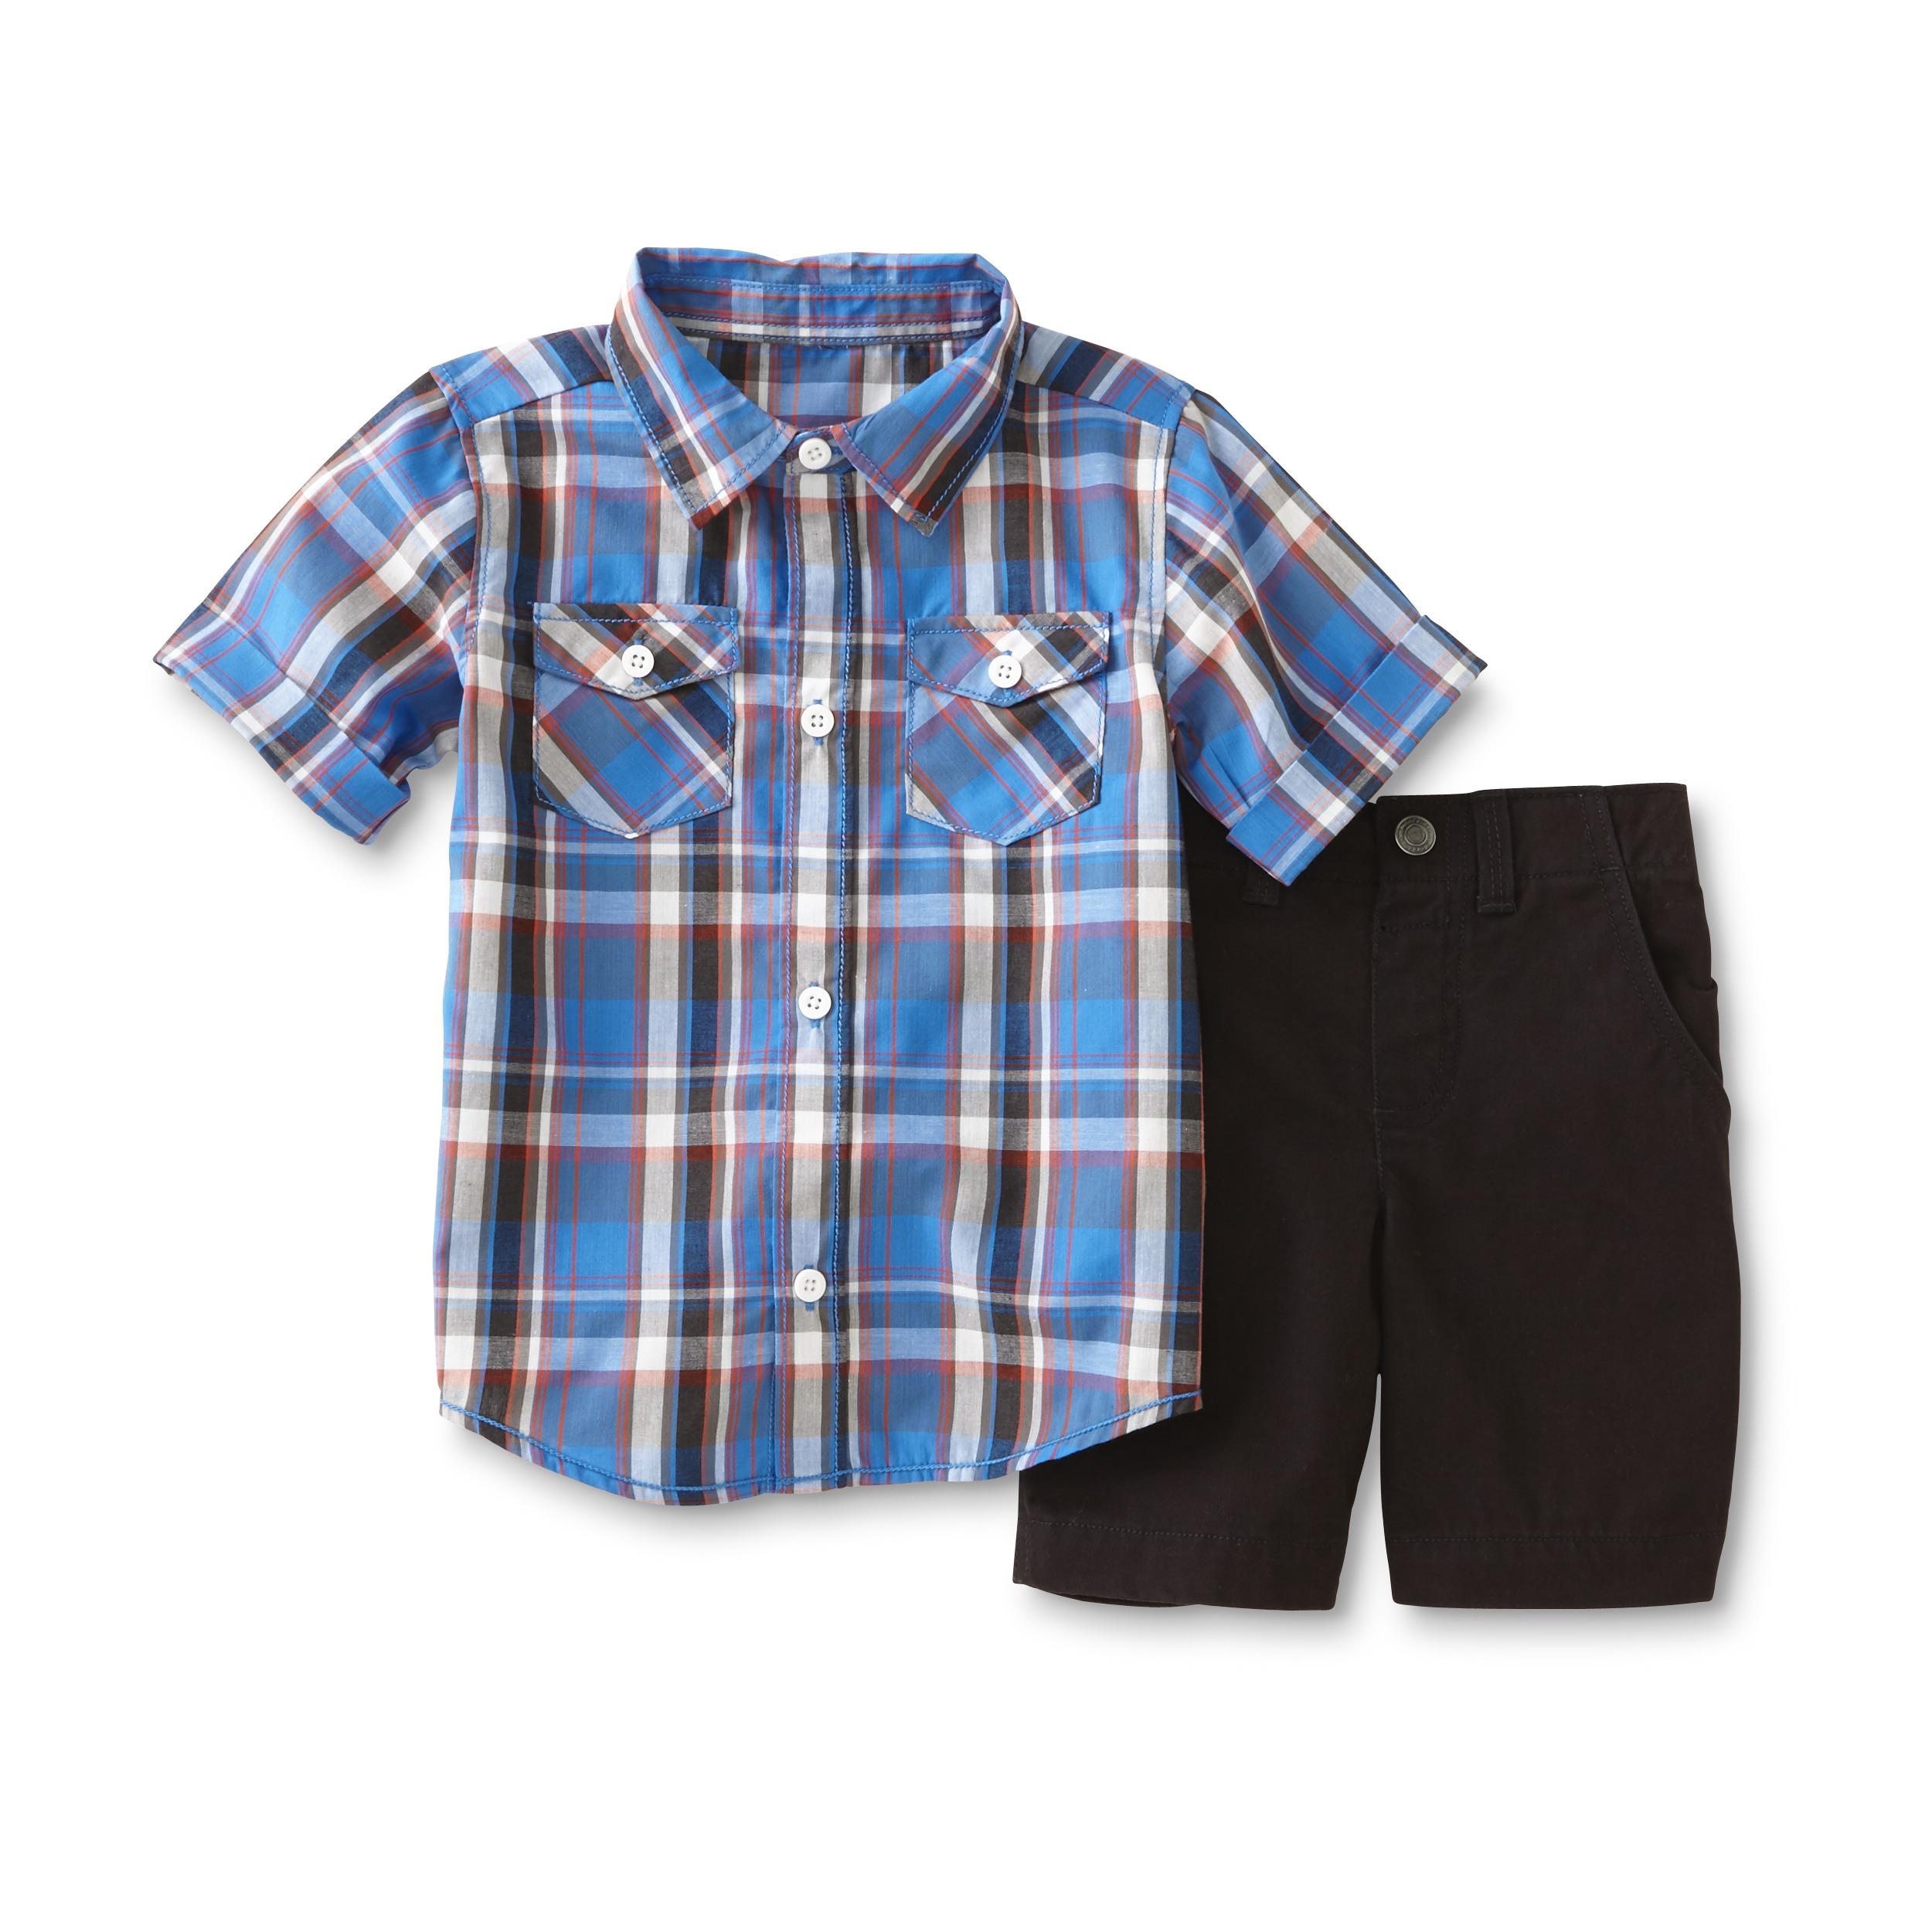 WonderKids Infant & Toddler Boy's Button-Front Shirt & Shorts - Plaid